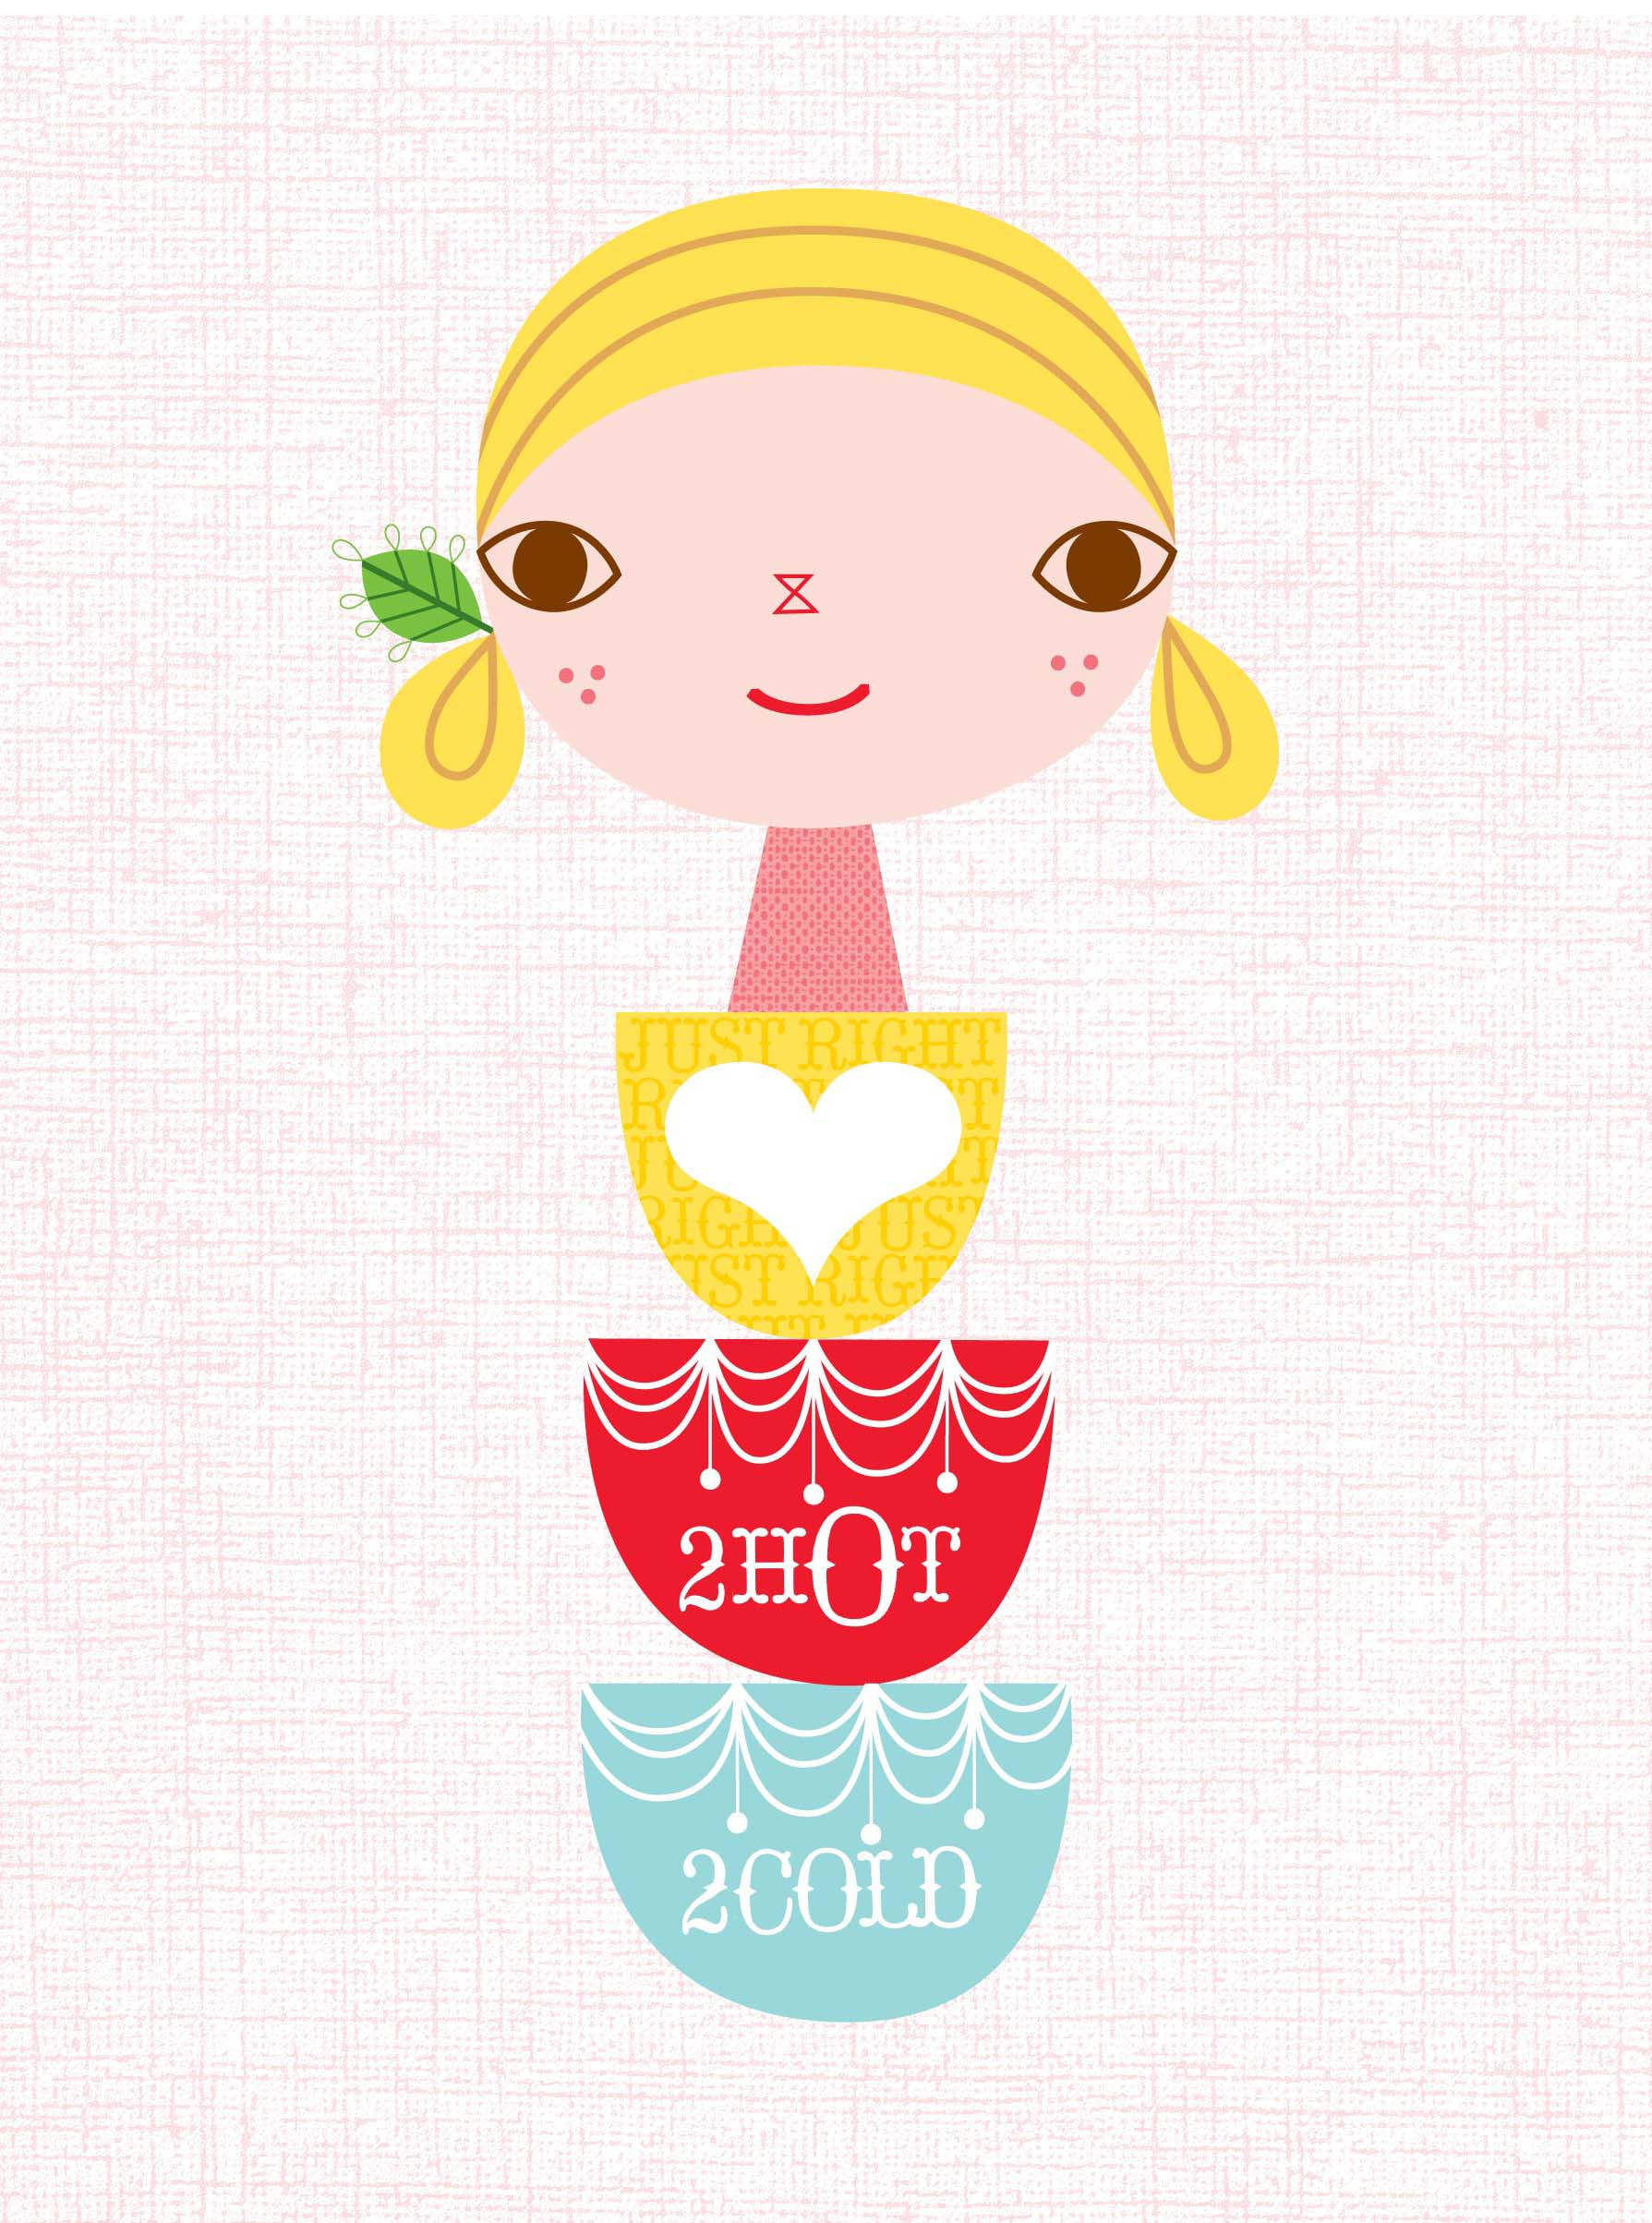 suzyu_chronicle_homesweethome_poster3.jpg